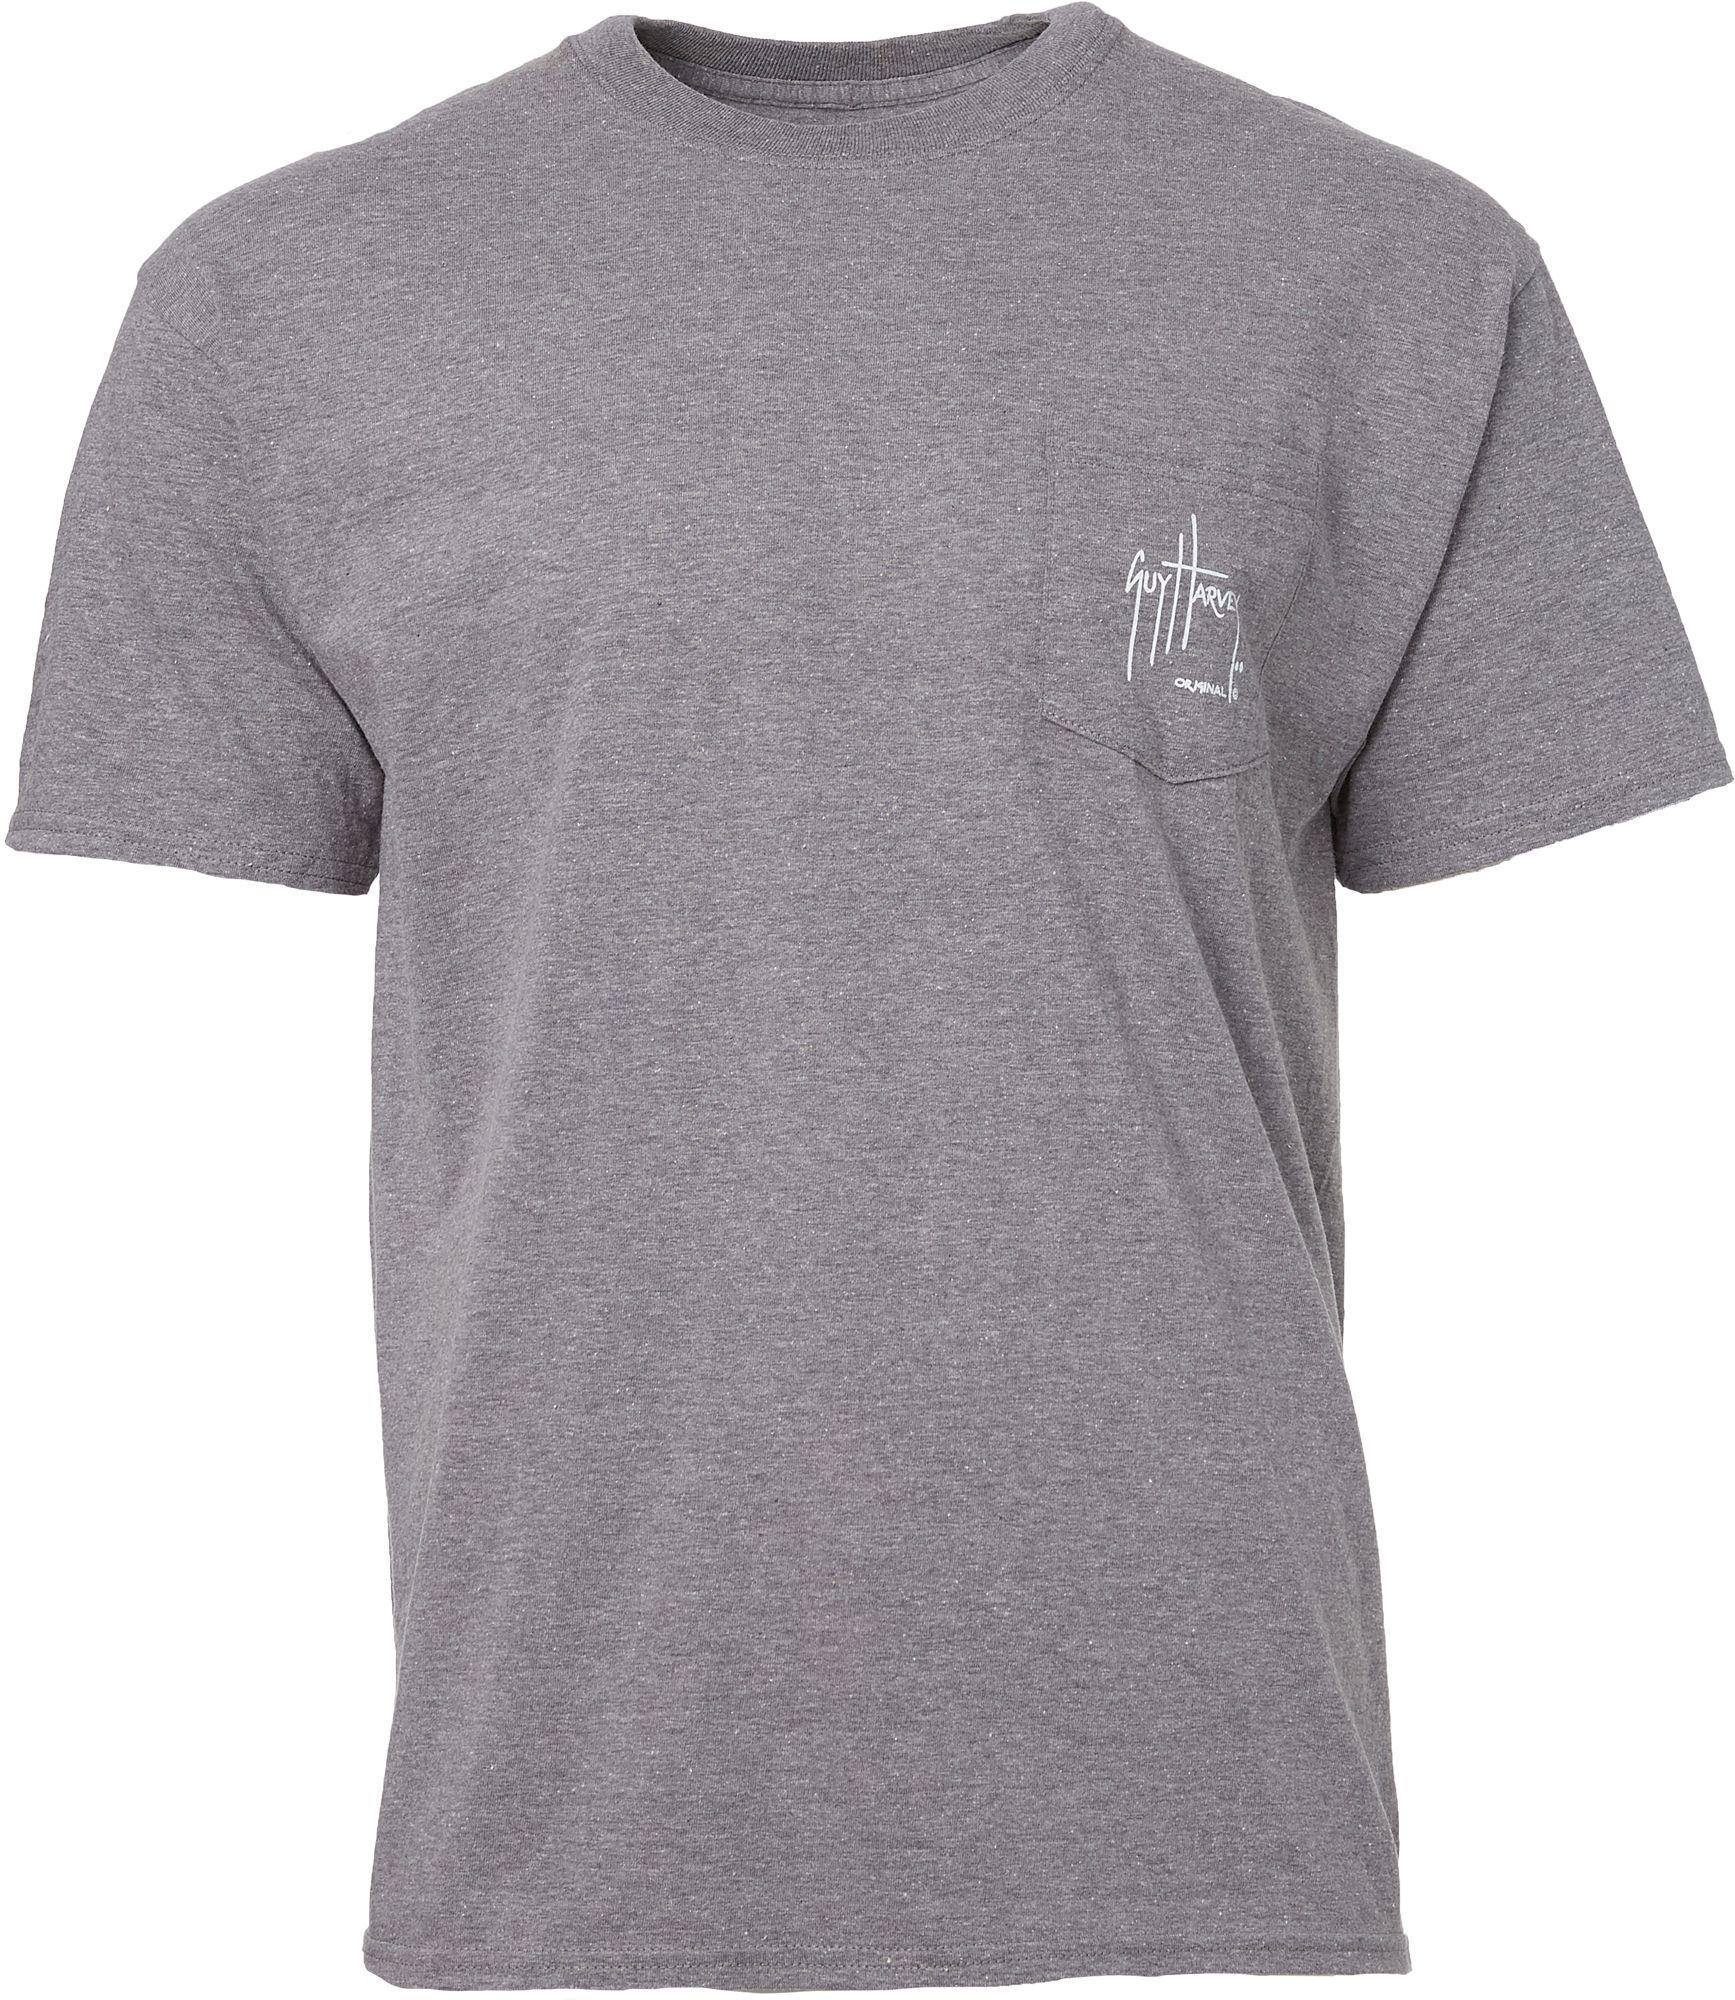 3fd2113a222a8 Lyst - Guy Harvey Mosaic Short Sleeve Tee in Gray for Men